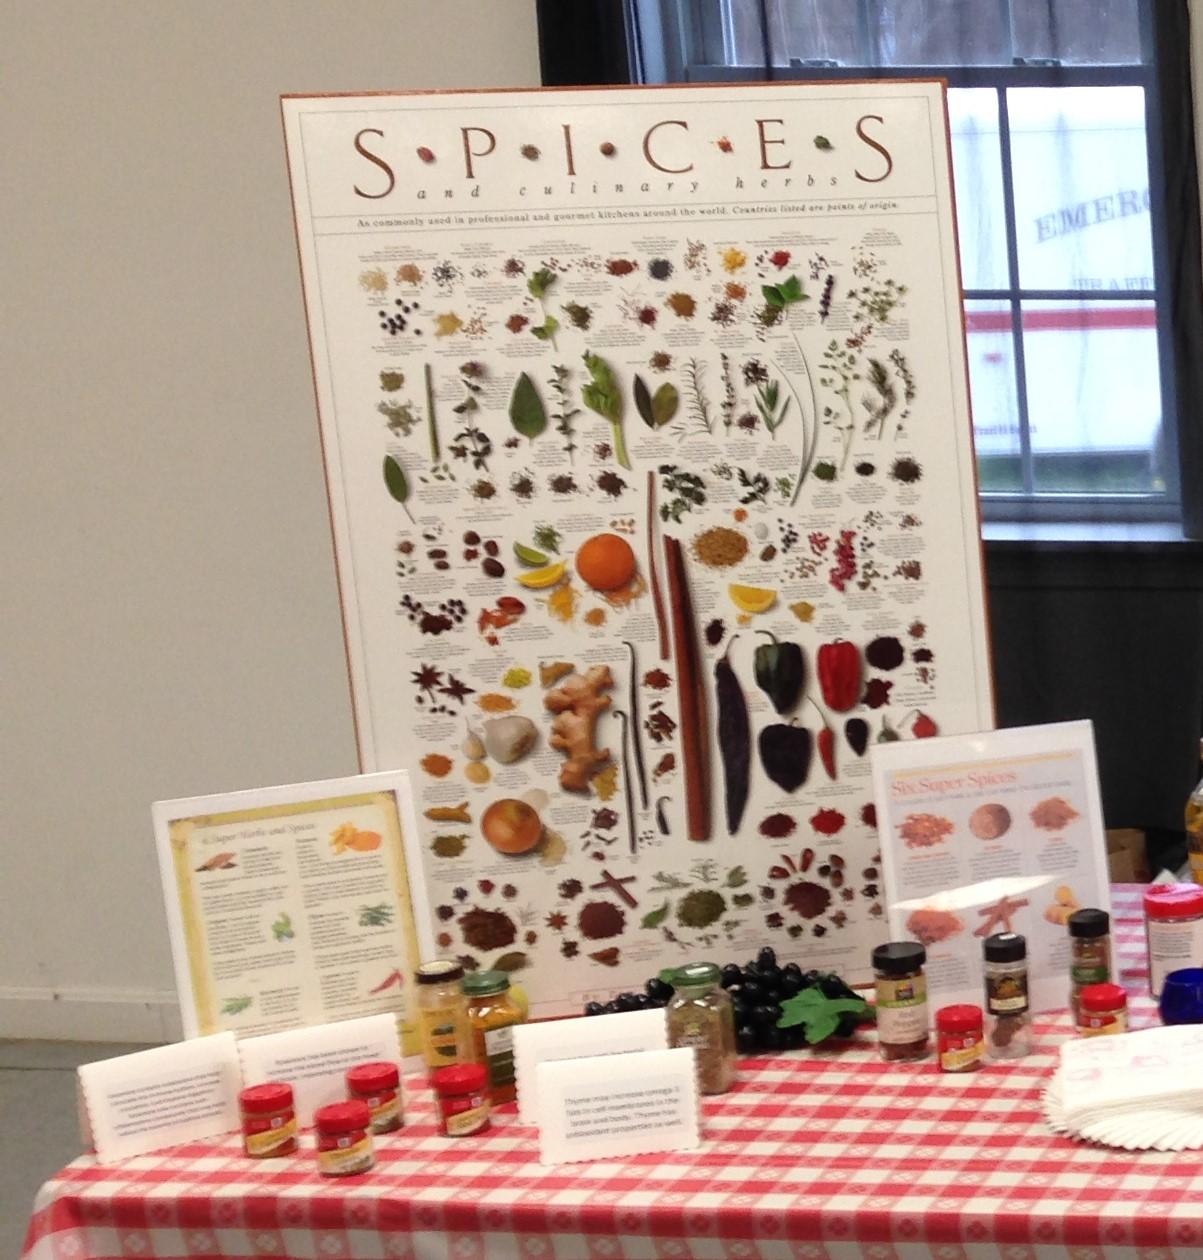 spice-for-health-seminar-boston.JPG